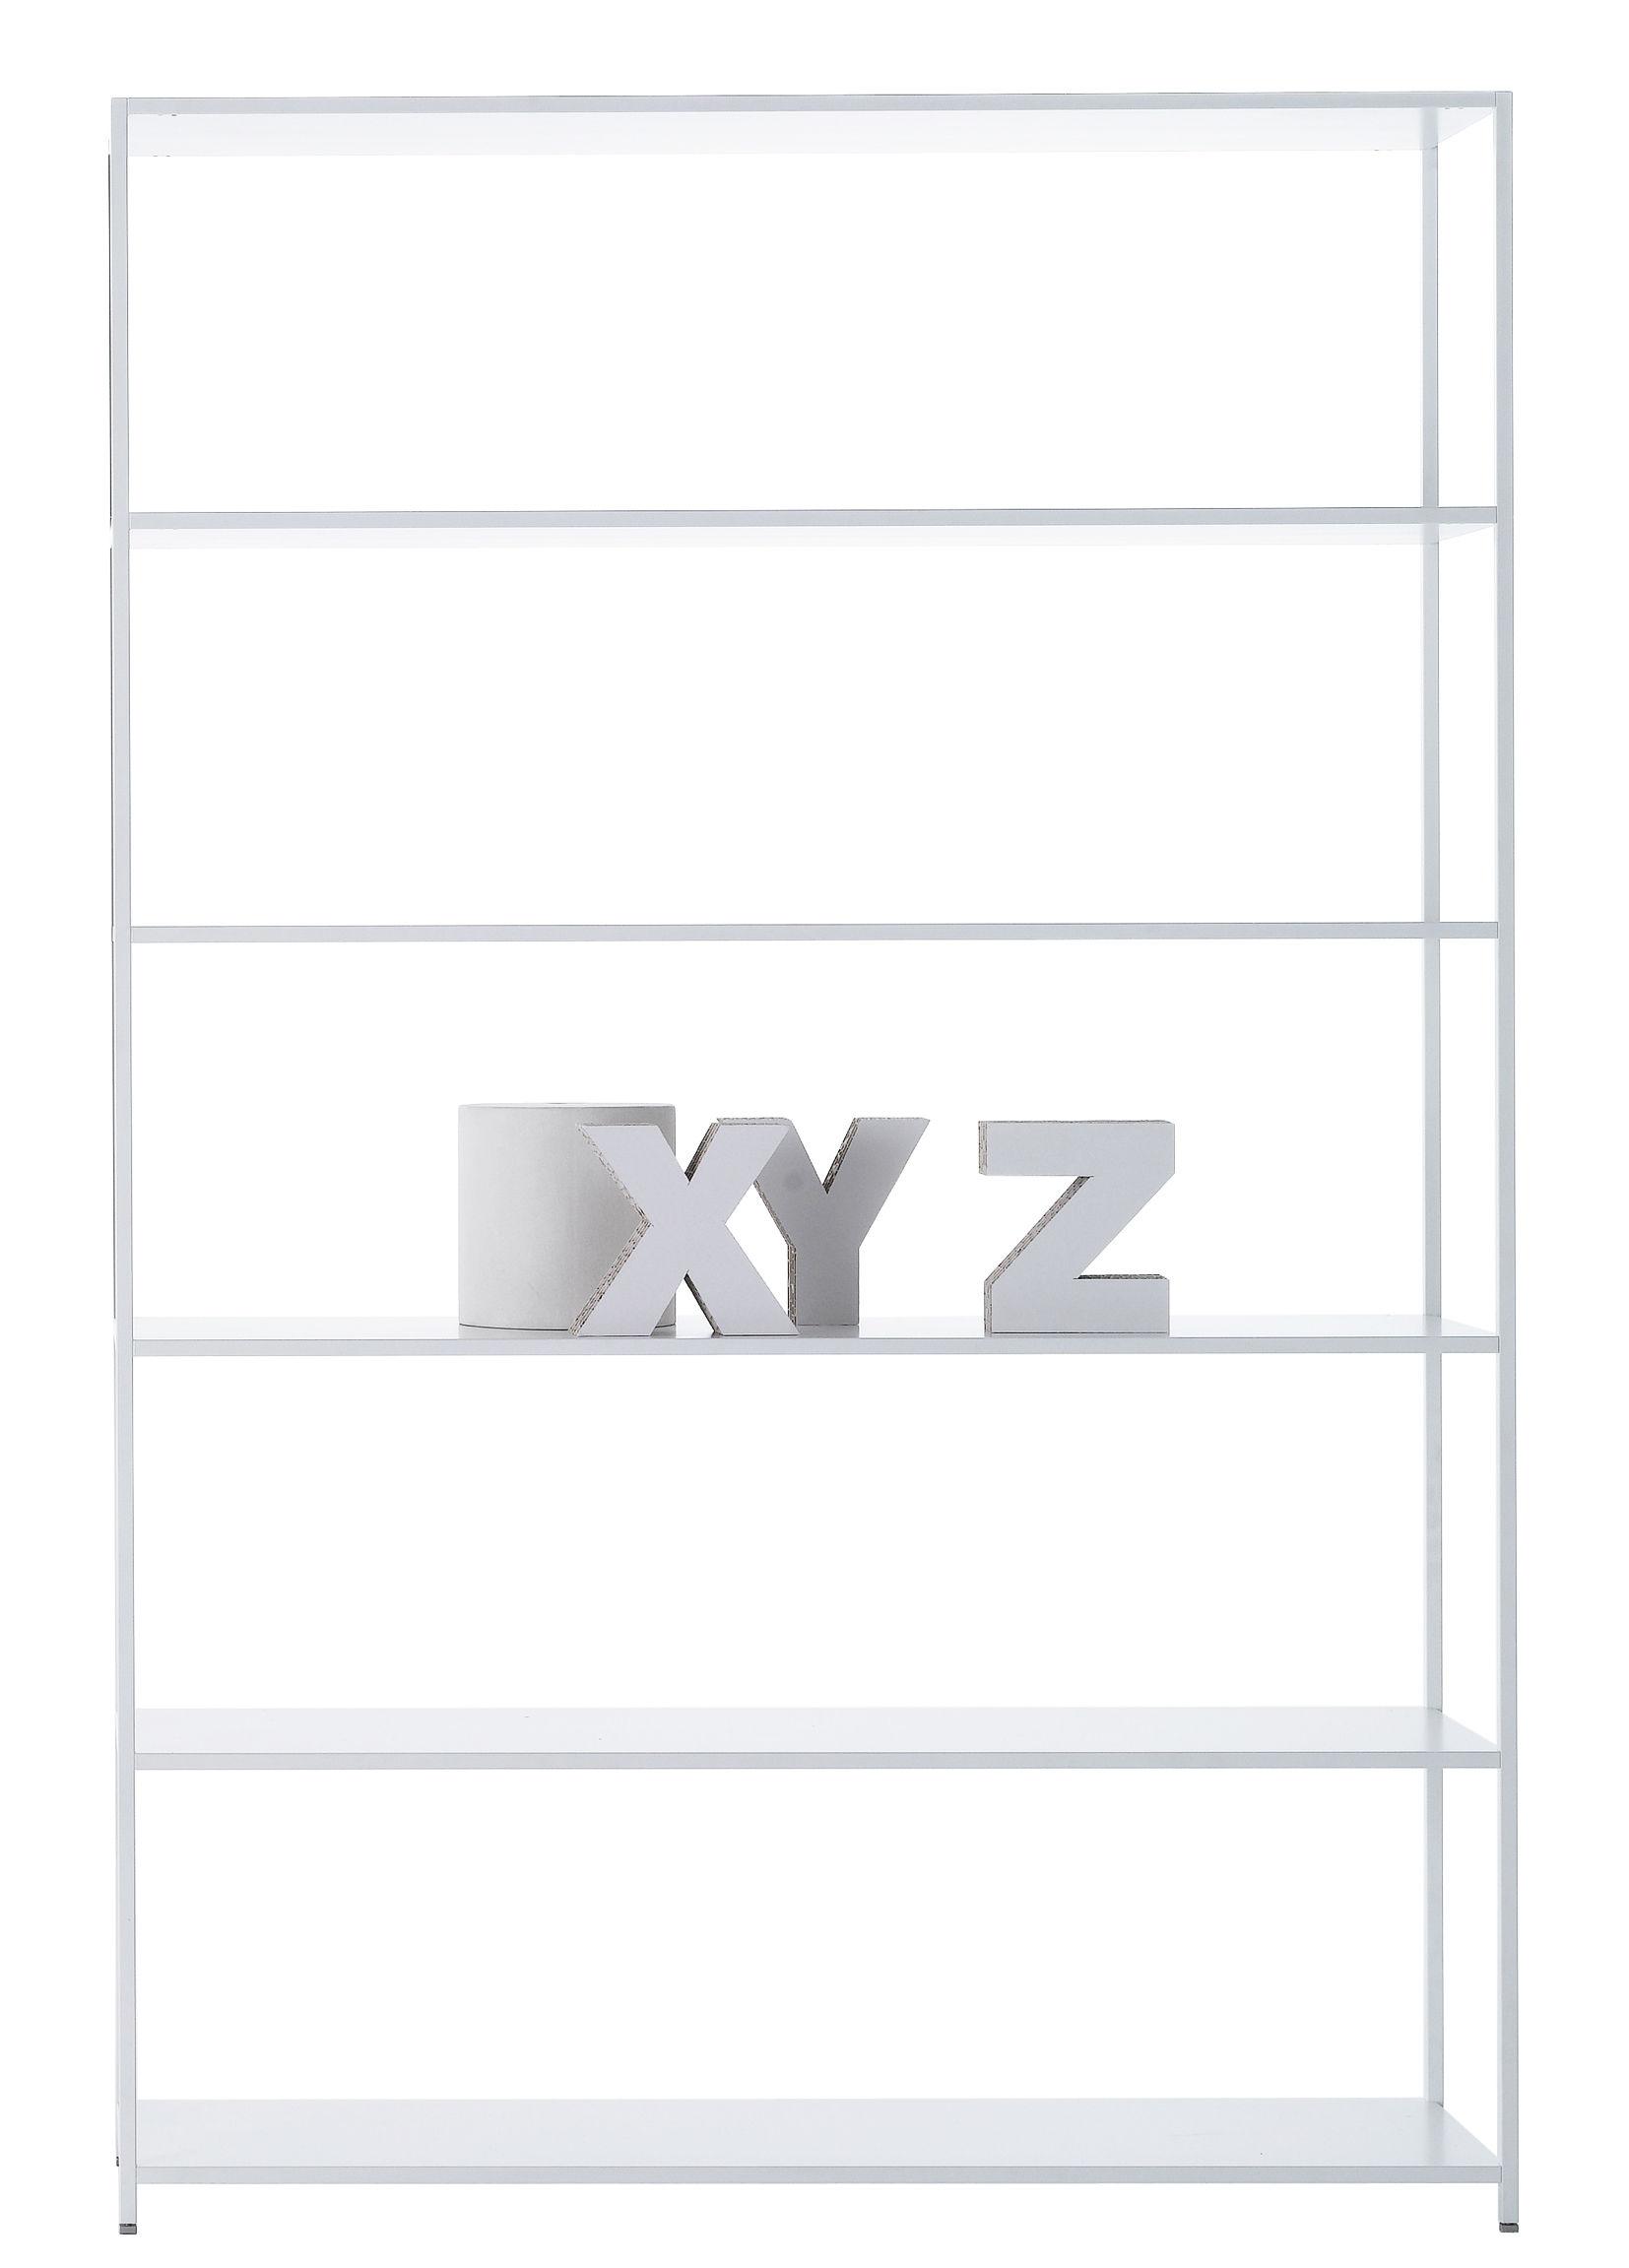 Mobilier - Etagères & bibliothèques - Bibliothèque Minima 3.0 / L 120 x H 188 cm - MDF Italia - Blanc - Aluminium